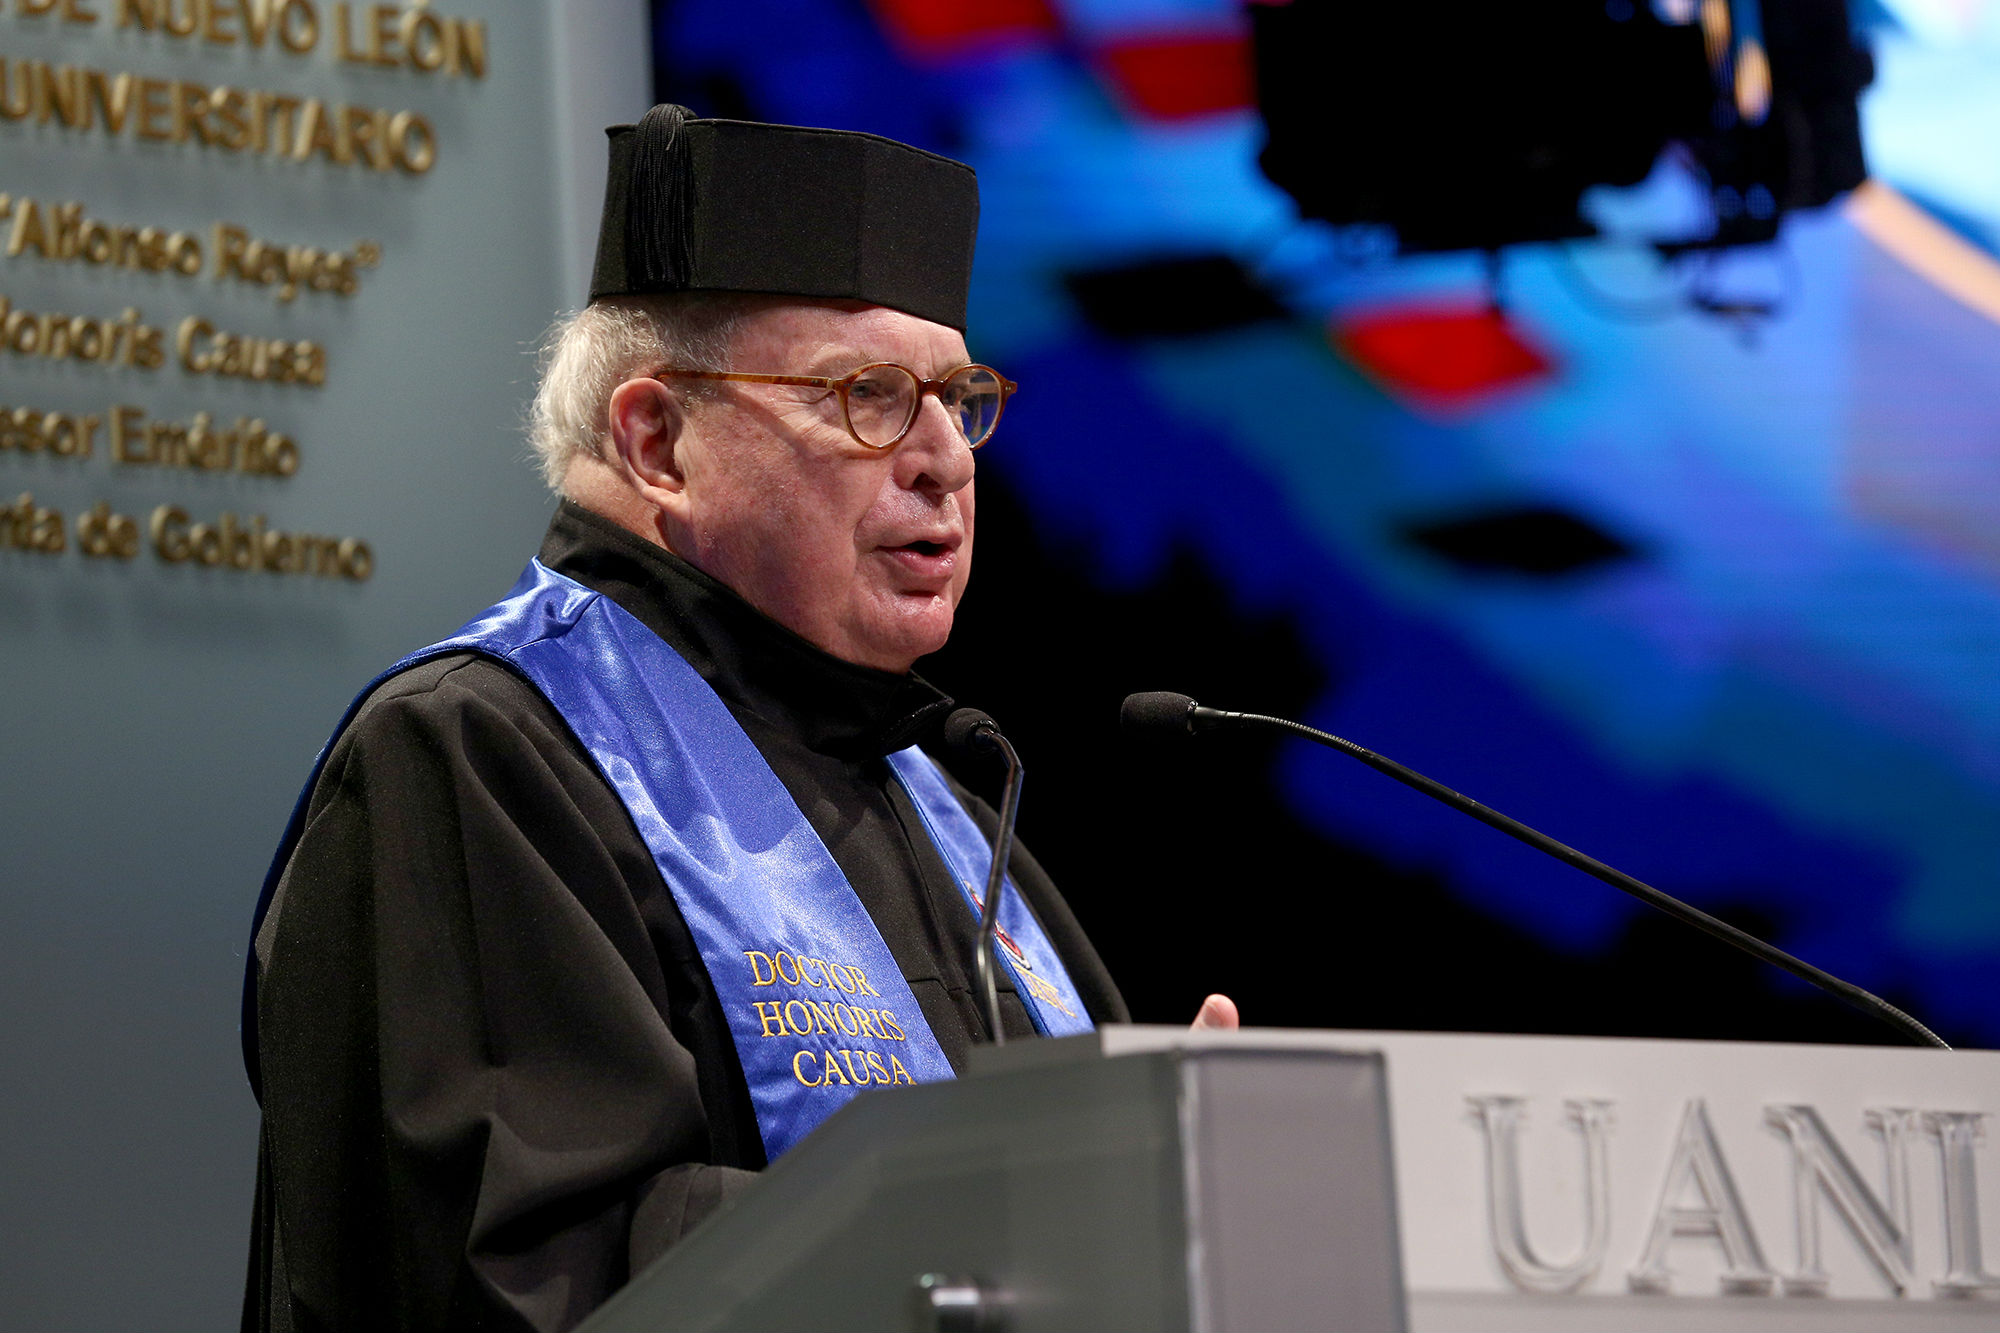 Doctor Honoris Causa al Dr. Albert Sasson